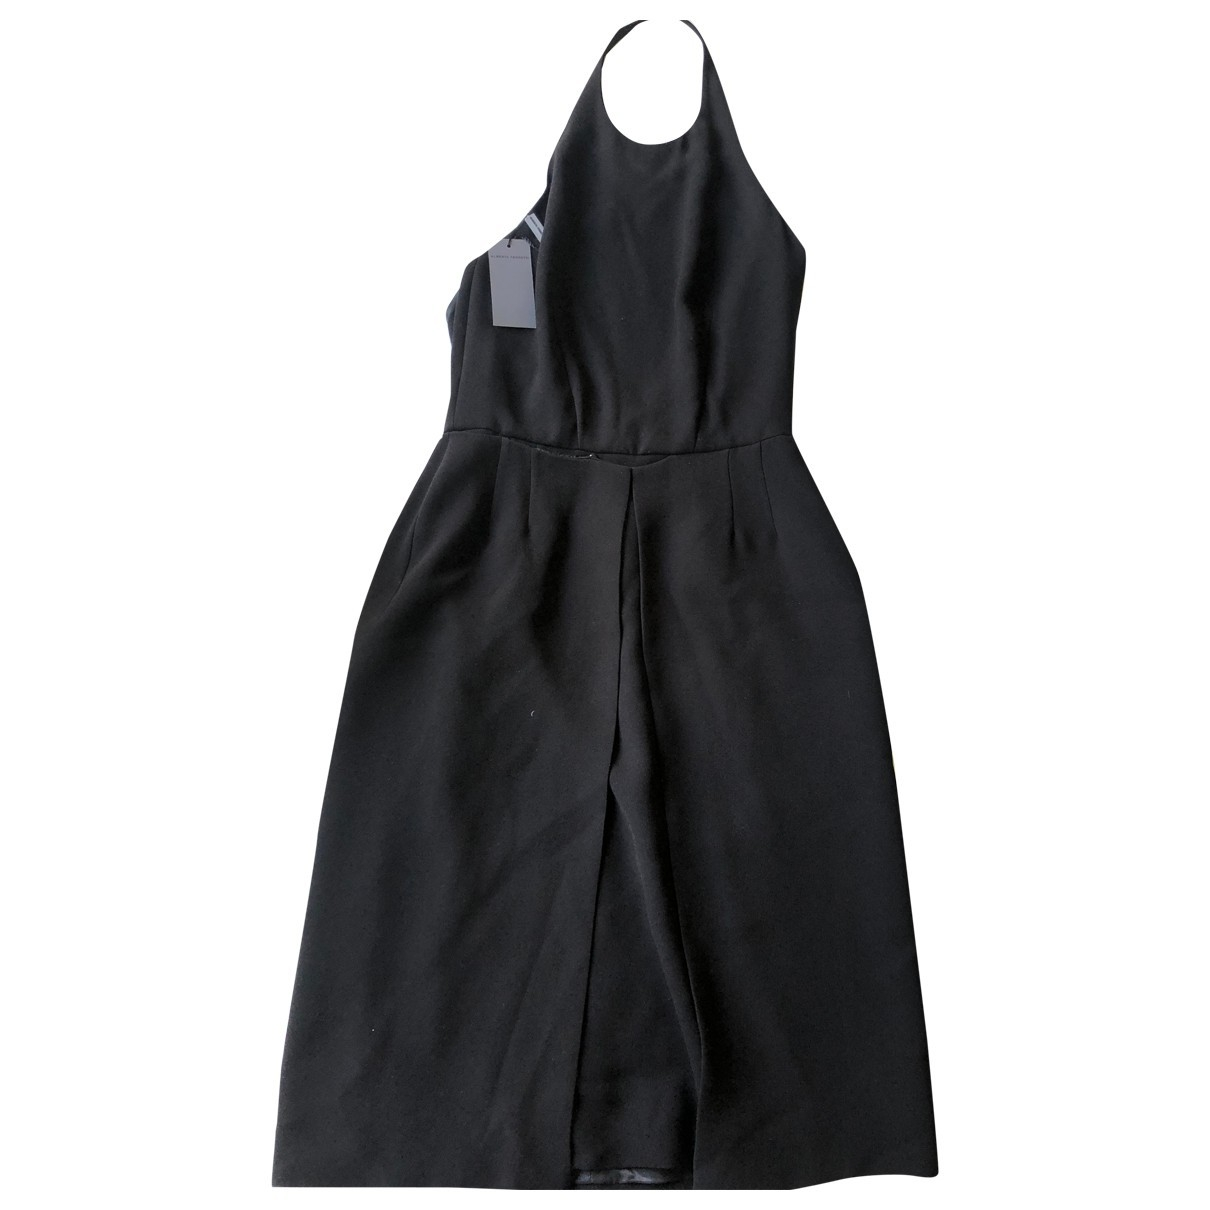 Alberta Ferretti \N Kleid in  Schwarz Synthetik